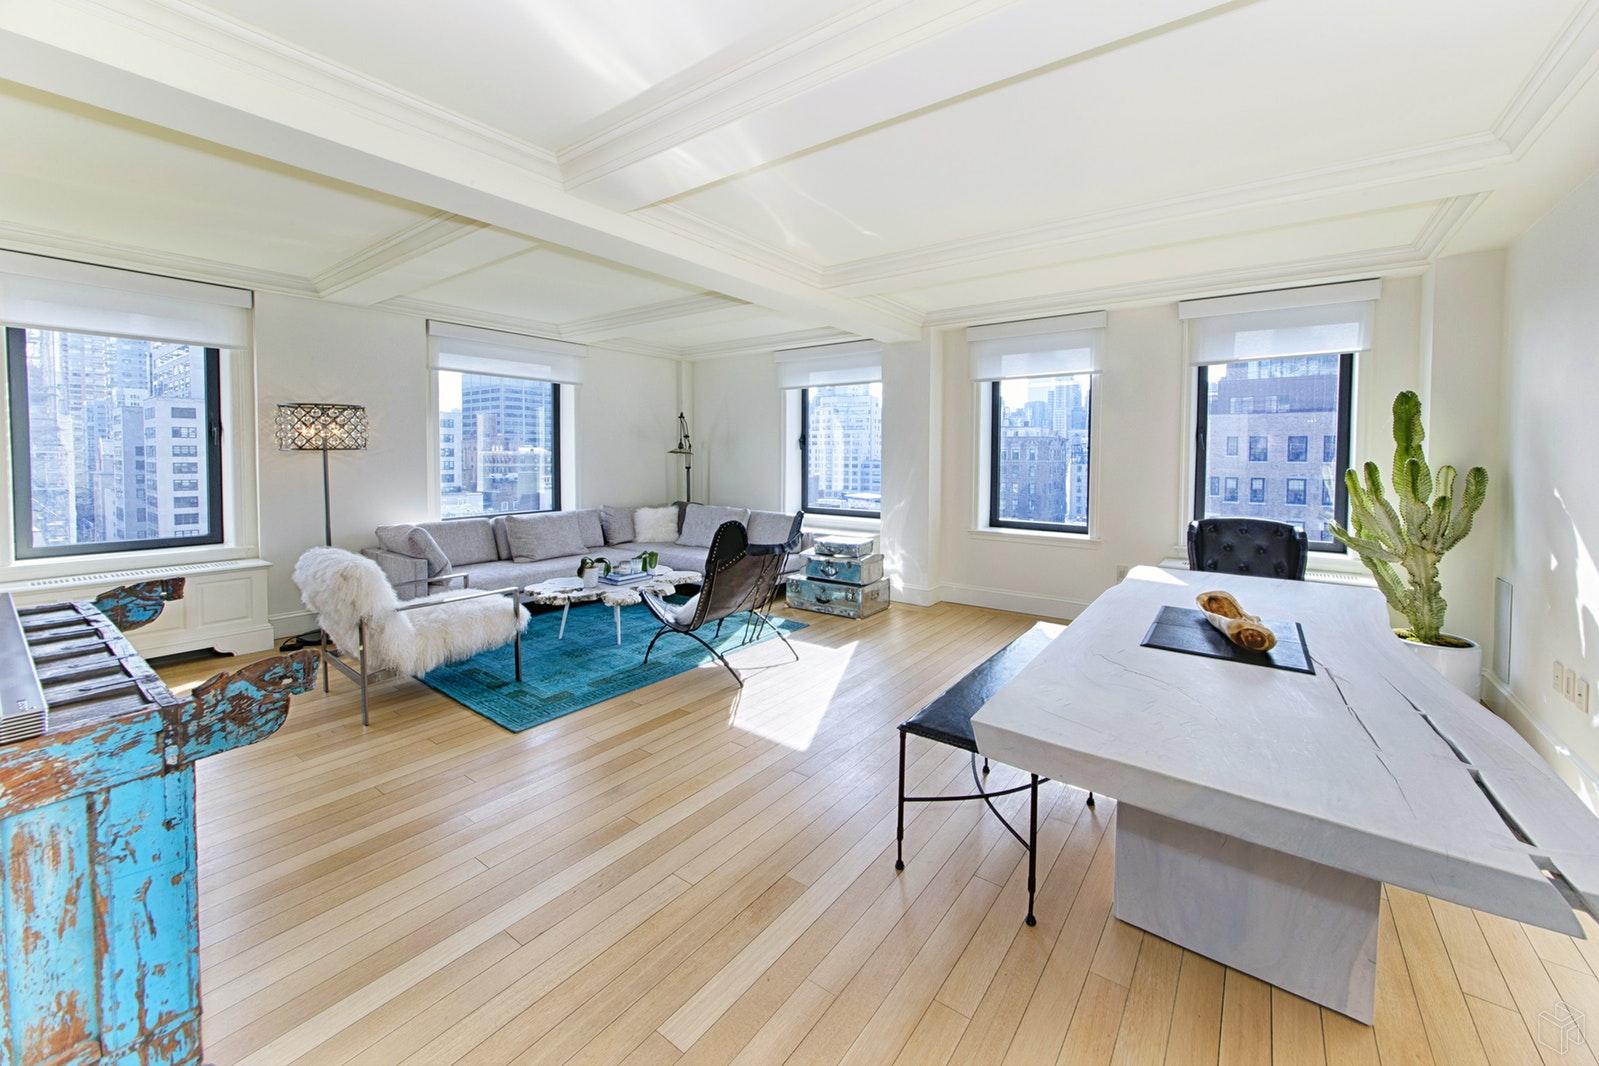 15 EAST 69TH STREET 11C, Upper East Side, $20,000, Web #: 19575401